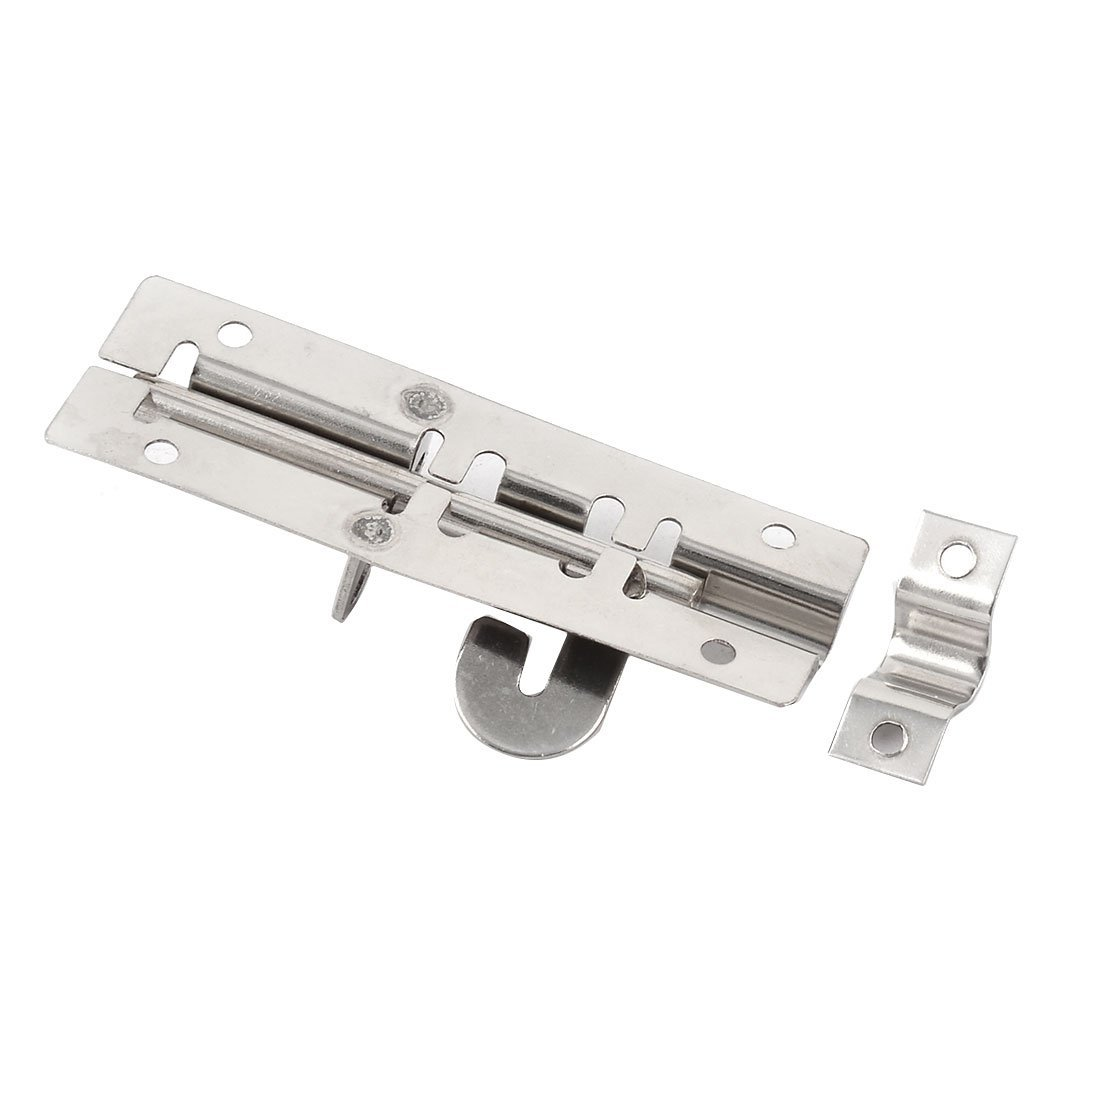 eDealMax puerta de la puerta del gabinete 10.5cm largos de acero inoxidable Pestillo Barril Perno de diapositivas tono Plata 3 PCS - - Amazon.com